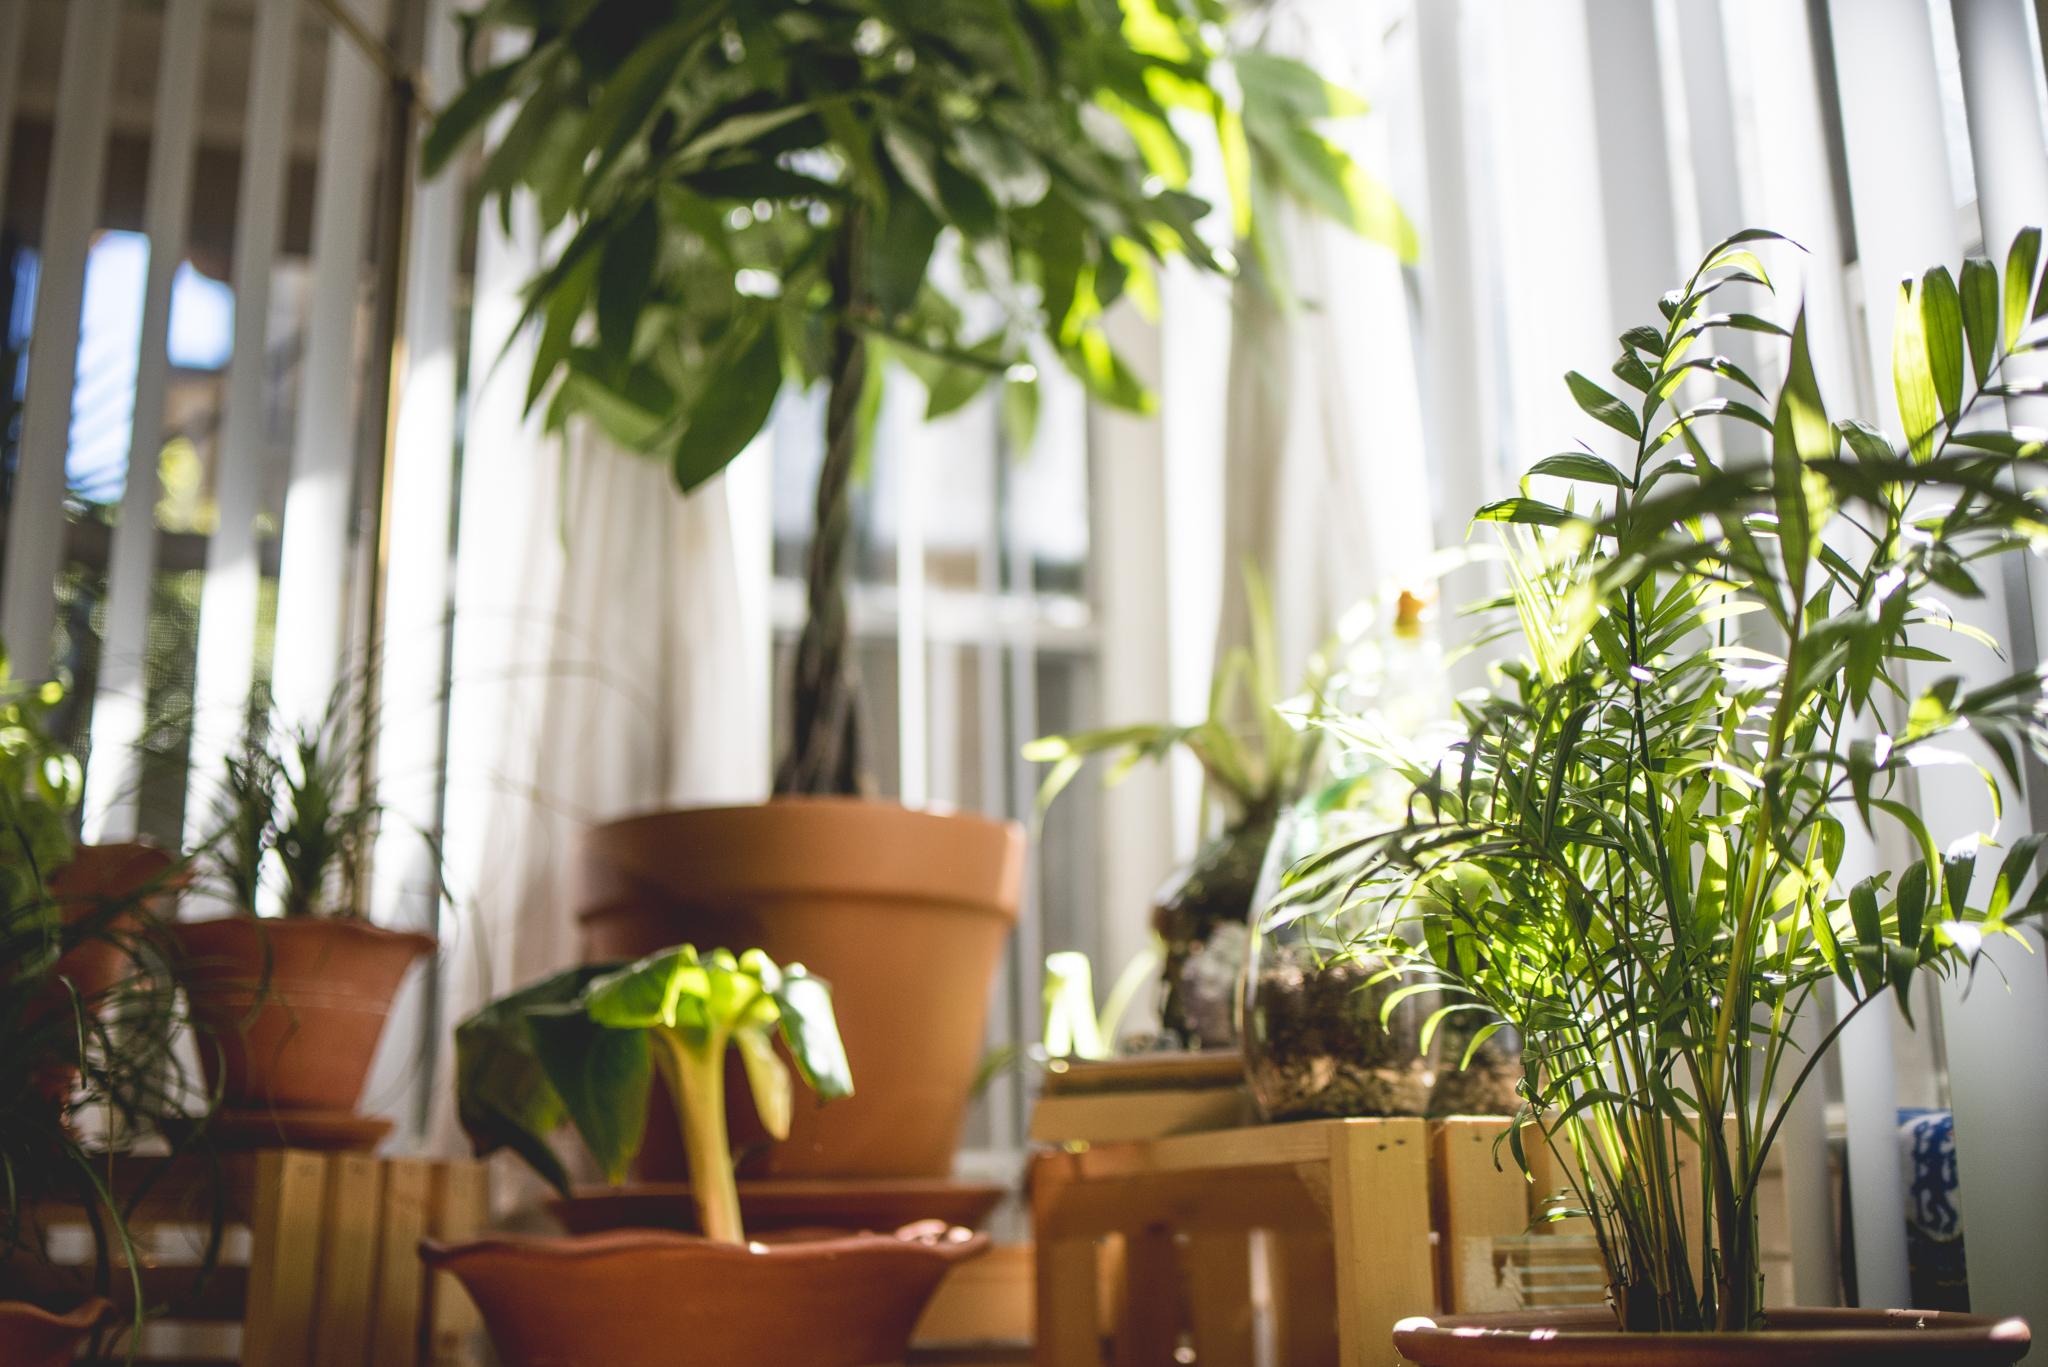 plantblog-13.jpg